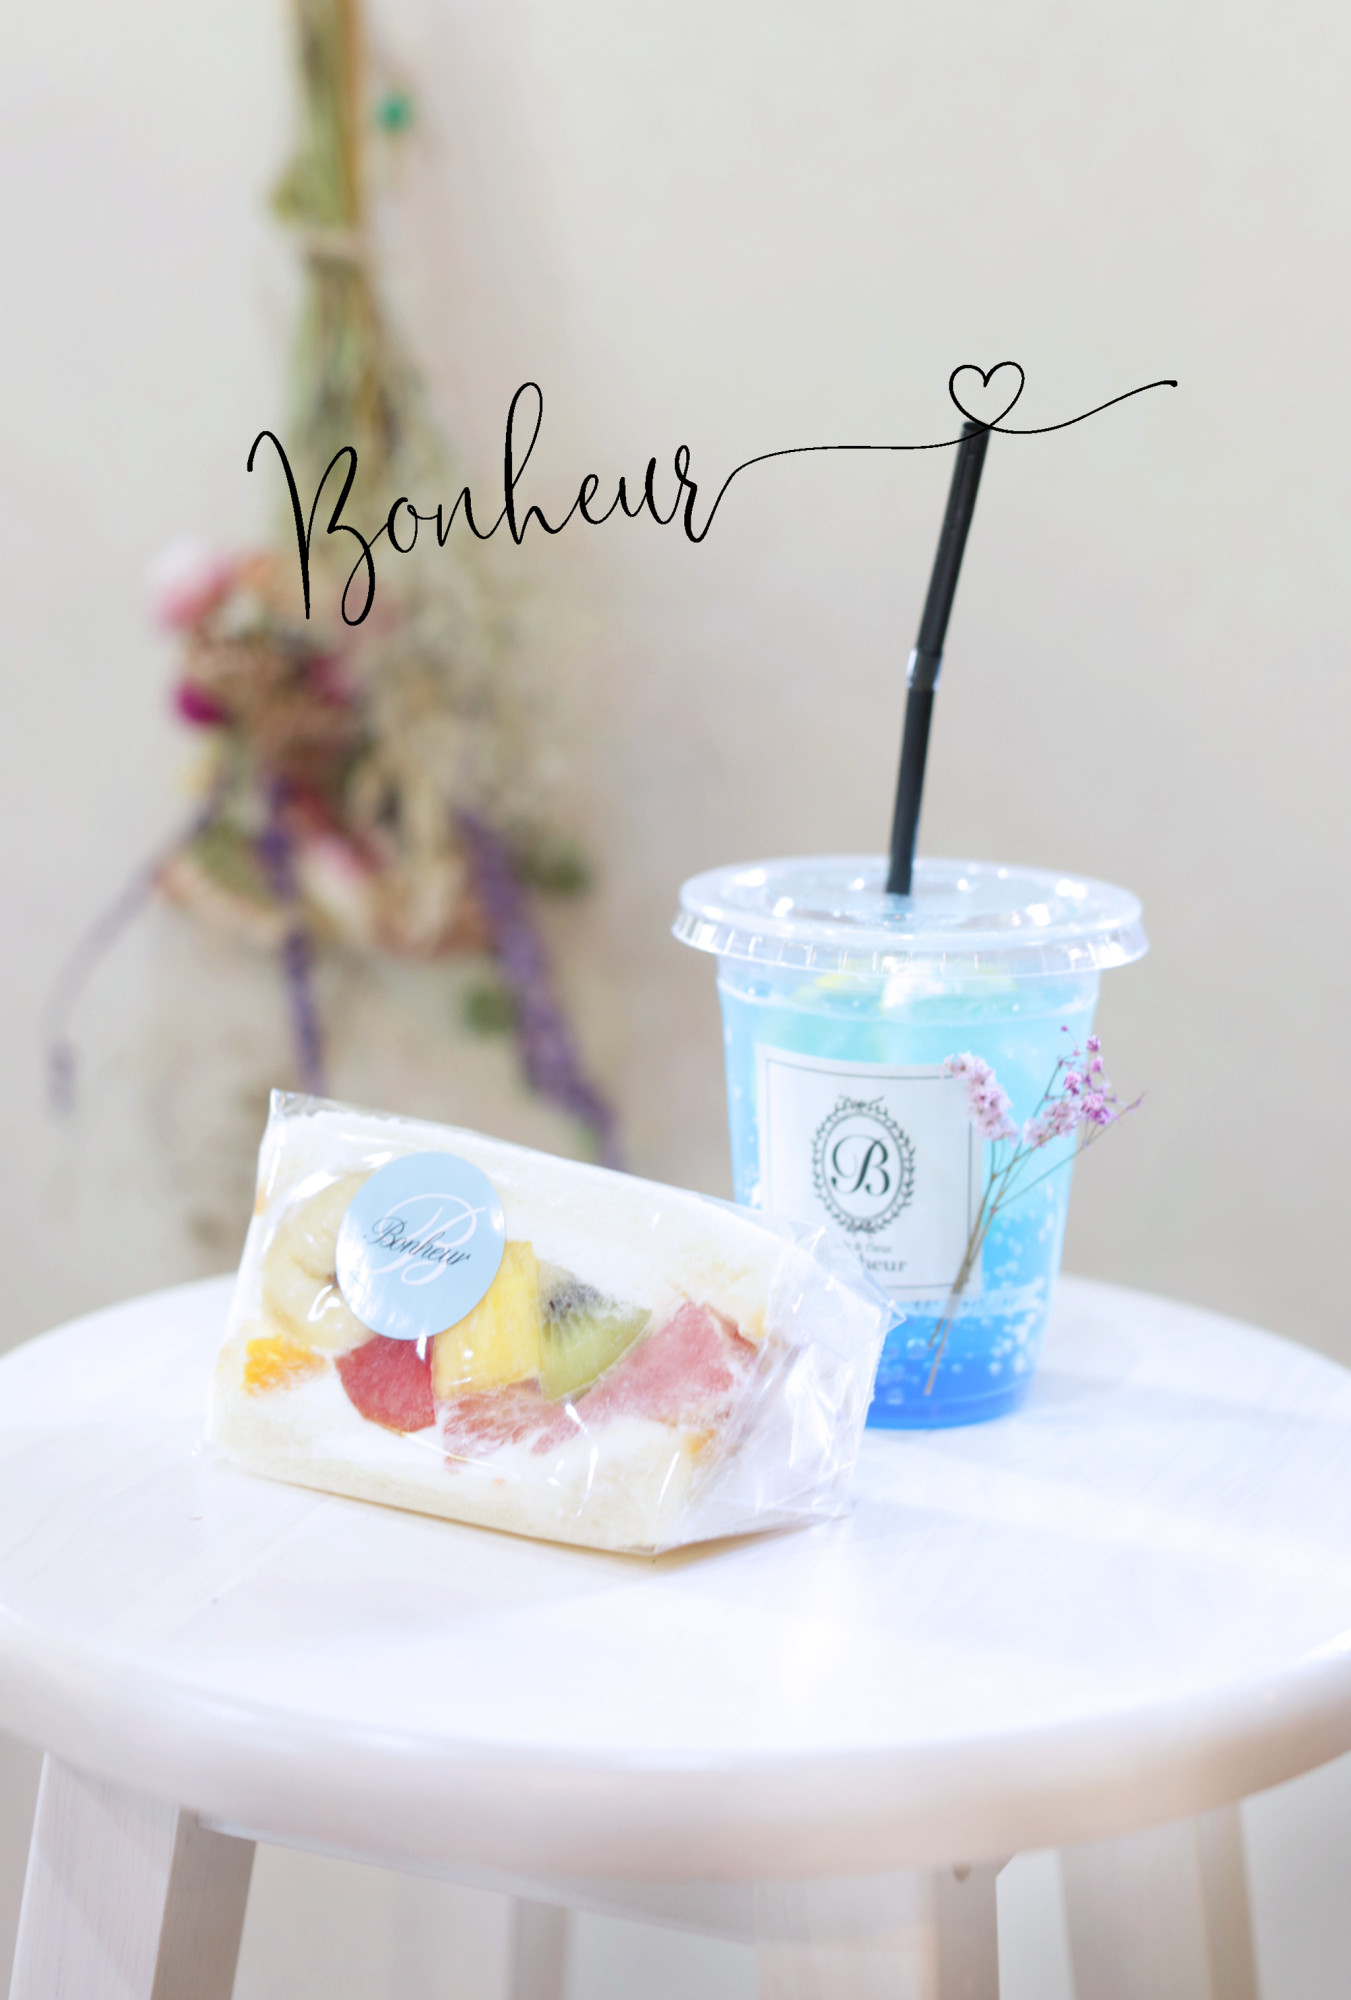 b_food20180712_1